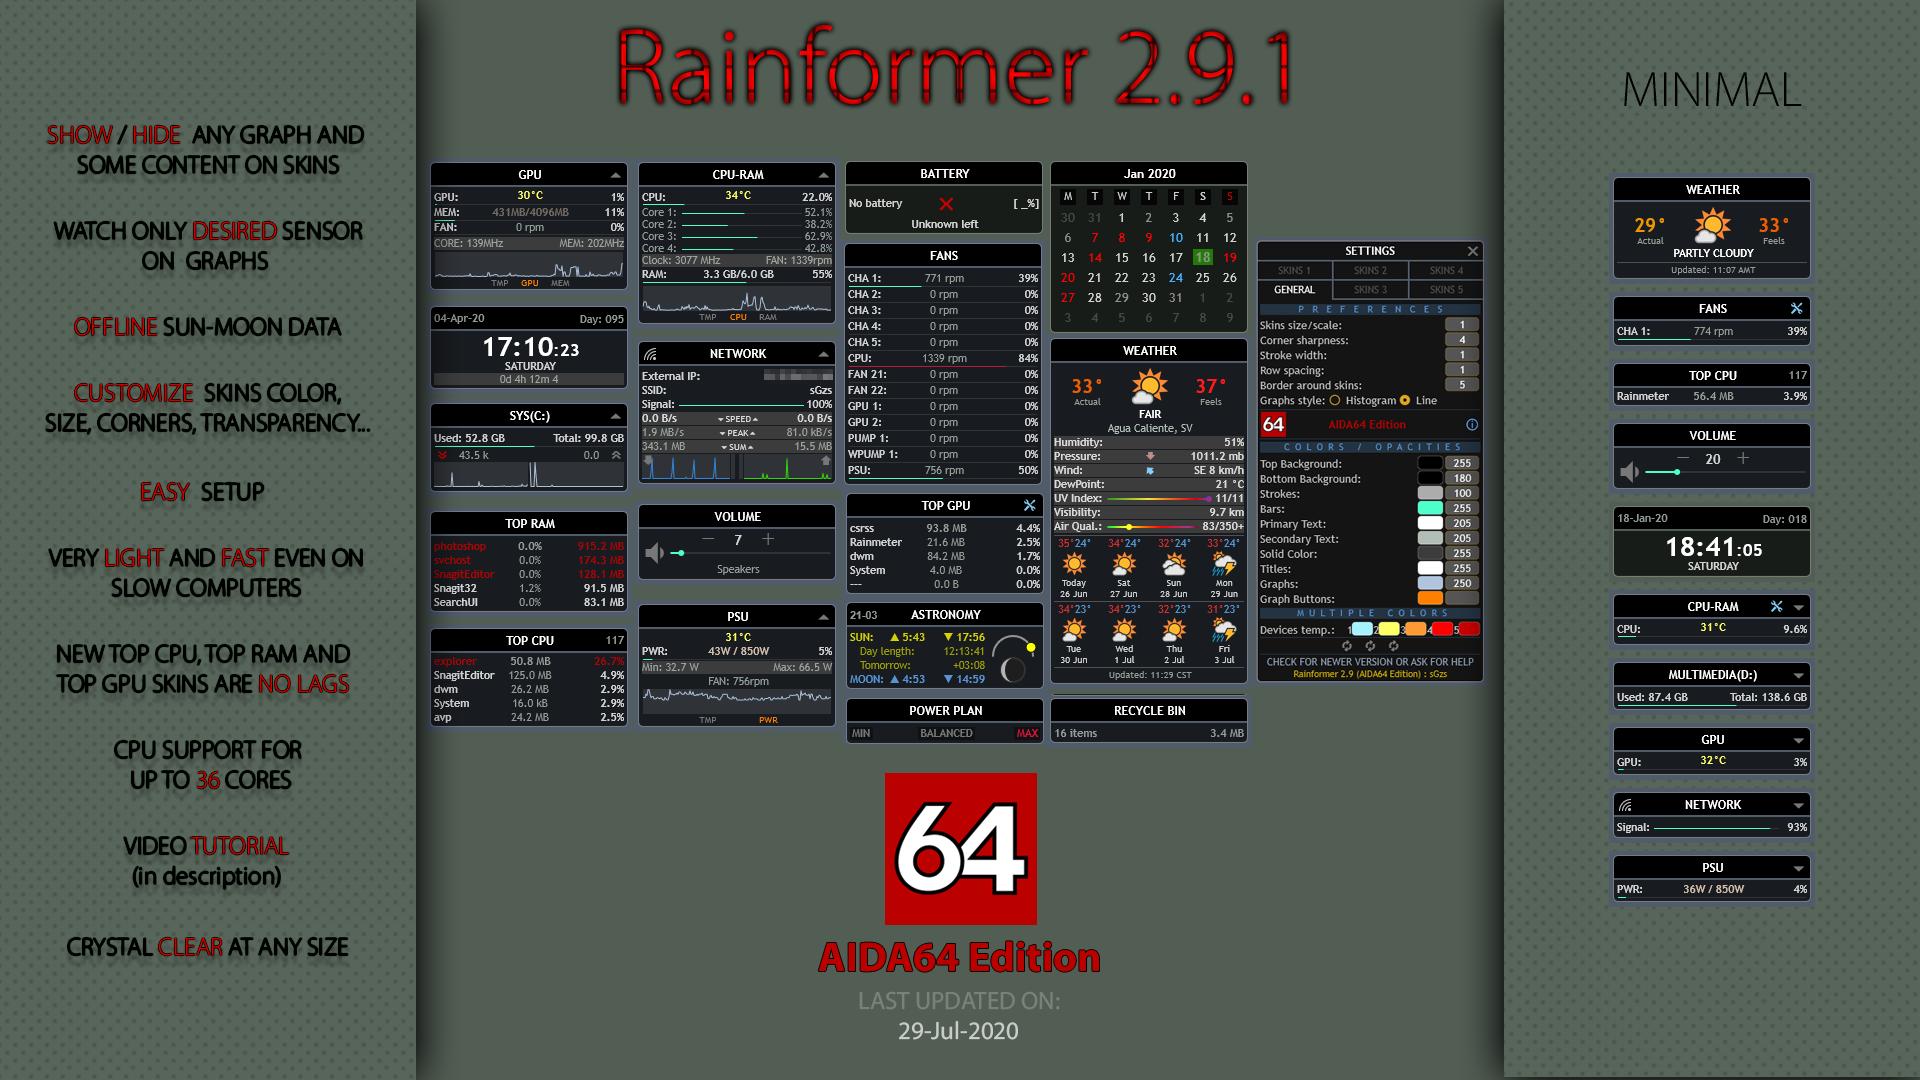 Rainformer 2.9.1 AIDA64 Edition | Rainmeter